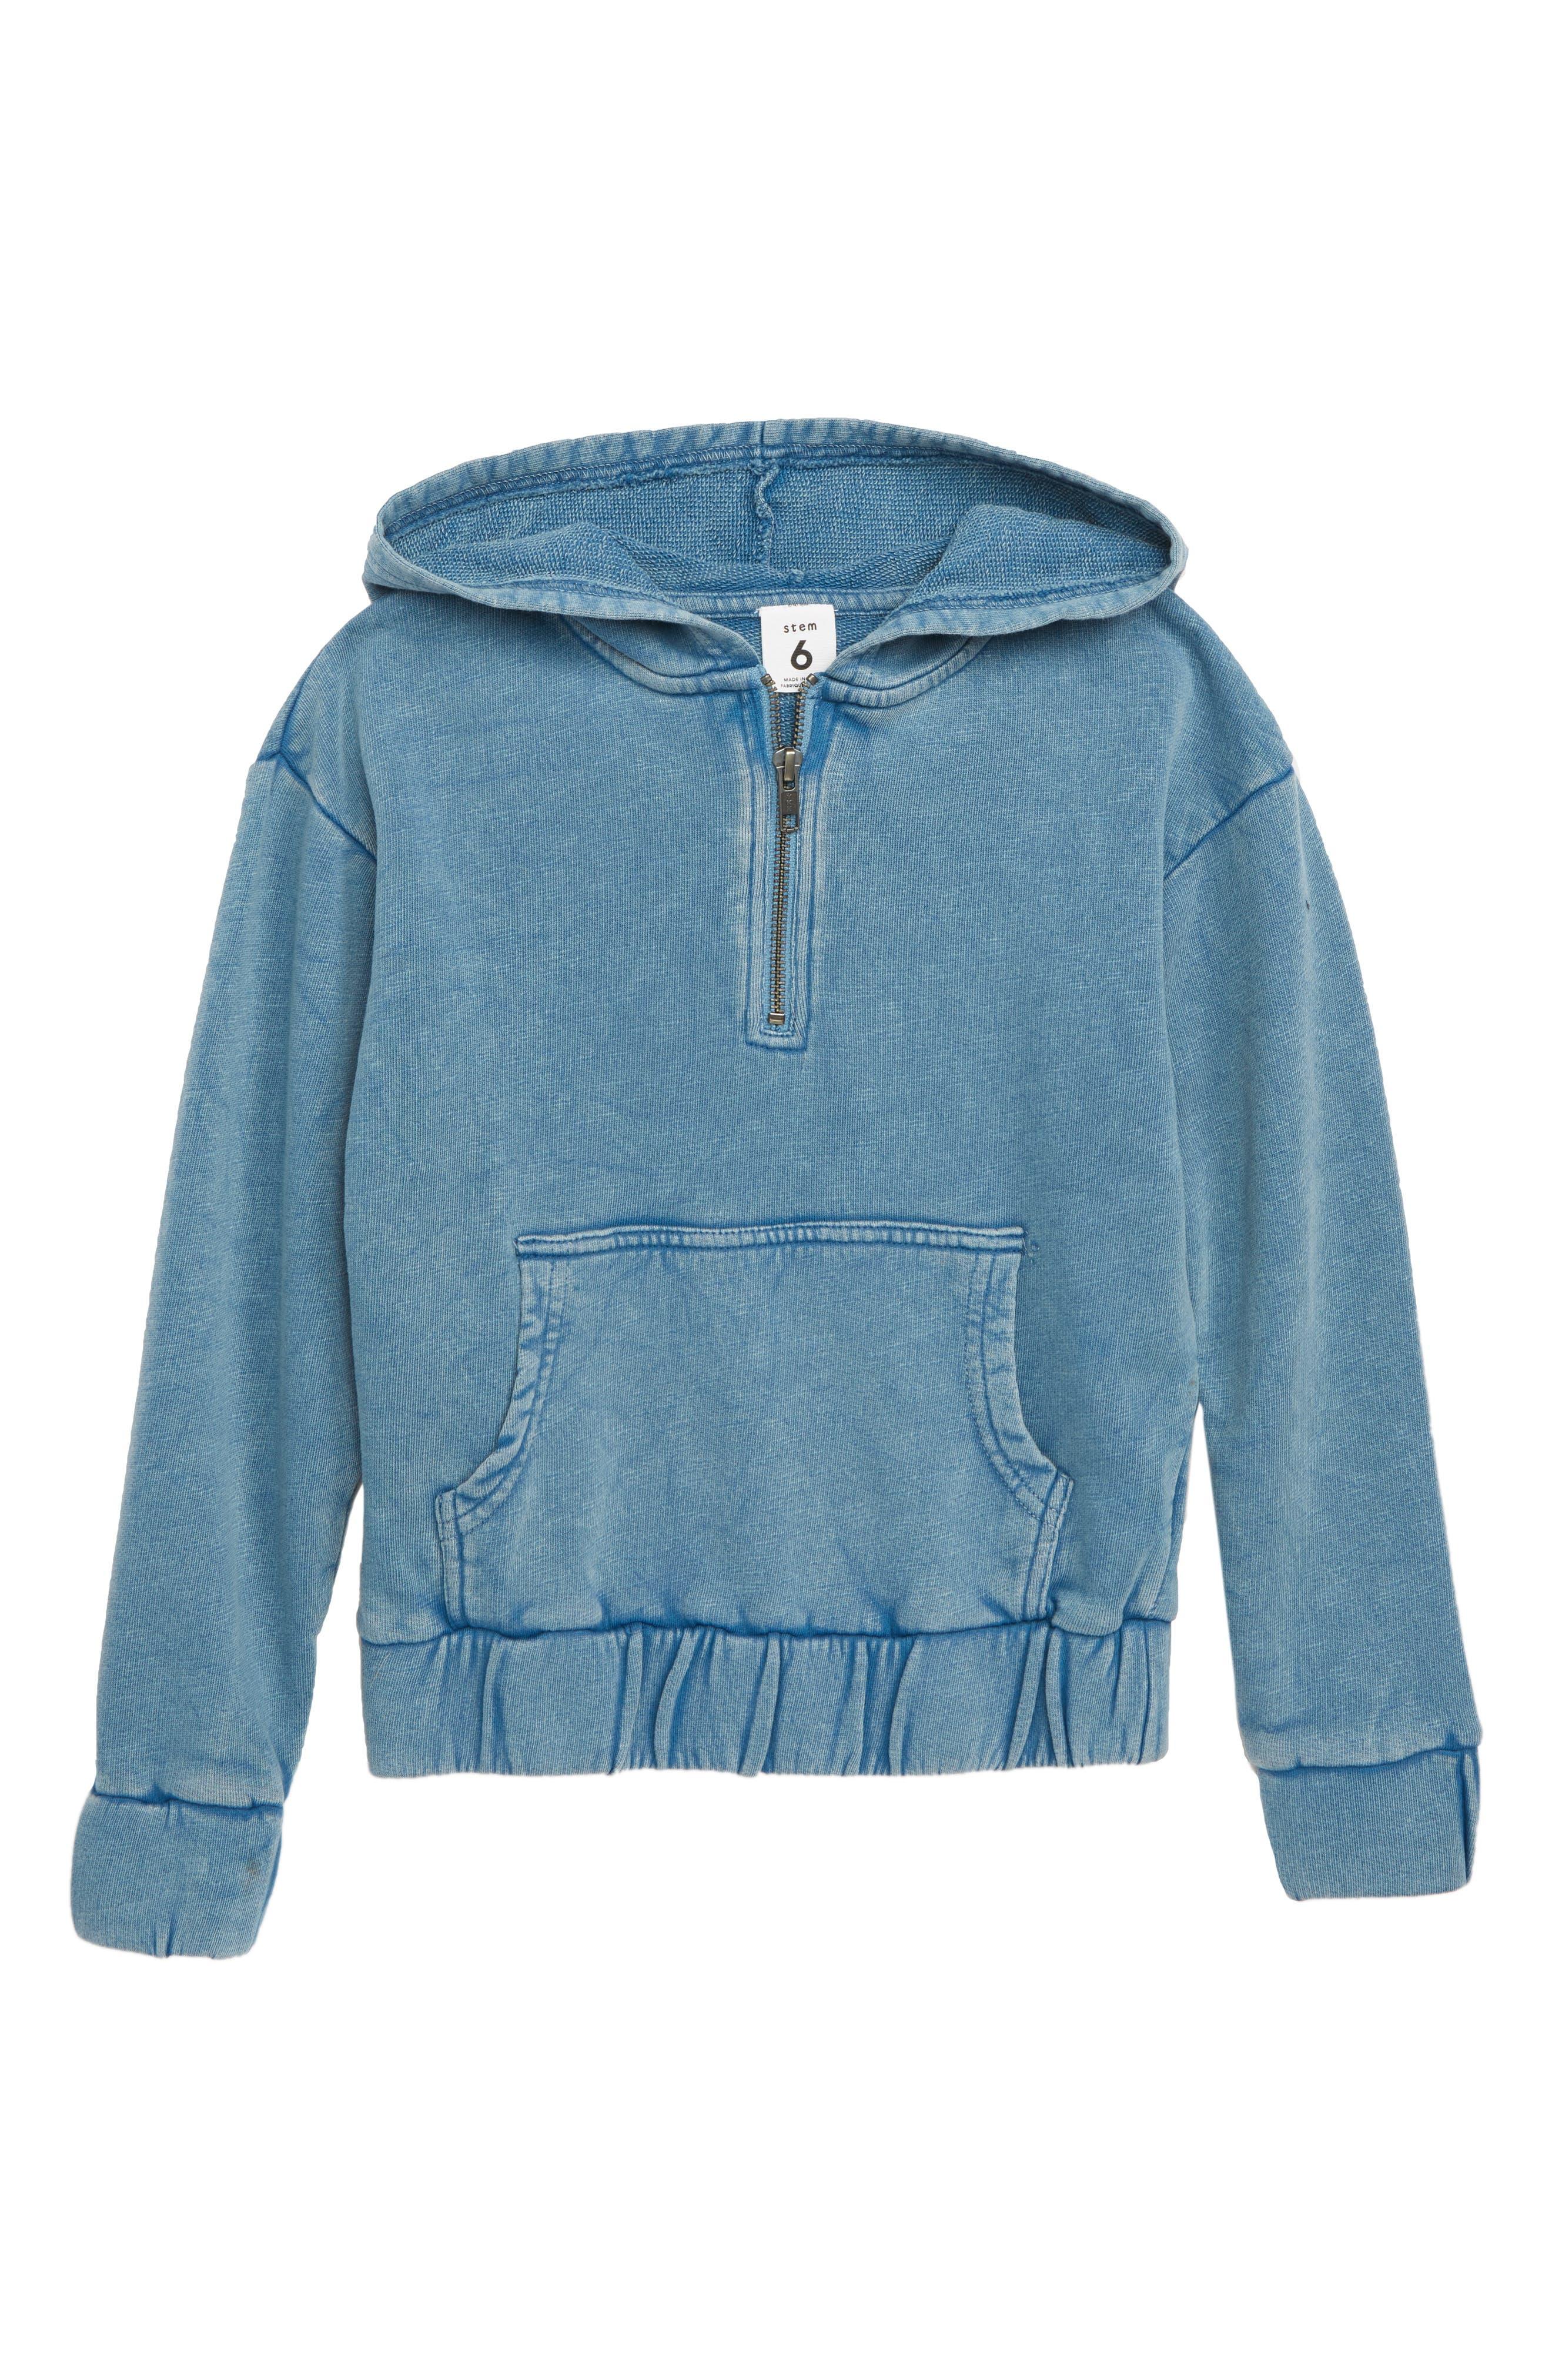 Quarter Zip Hoodie,                             Main thumbnail 1, color,                             BLUE BOAT